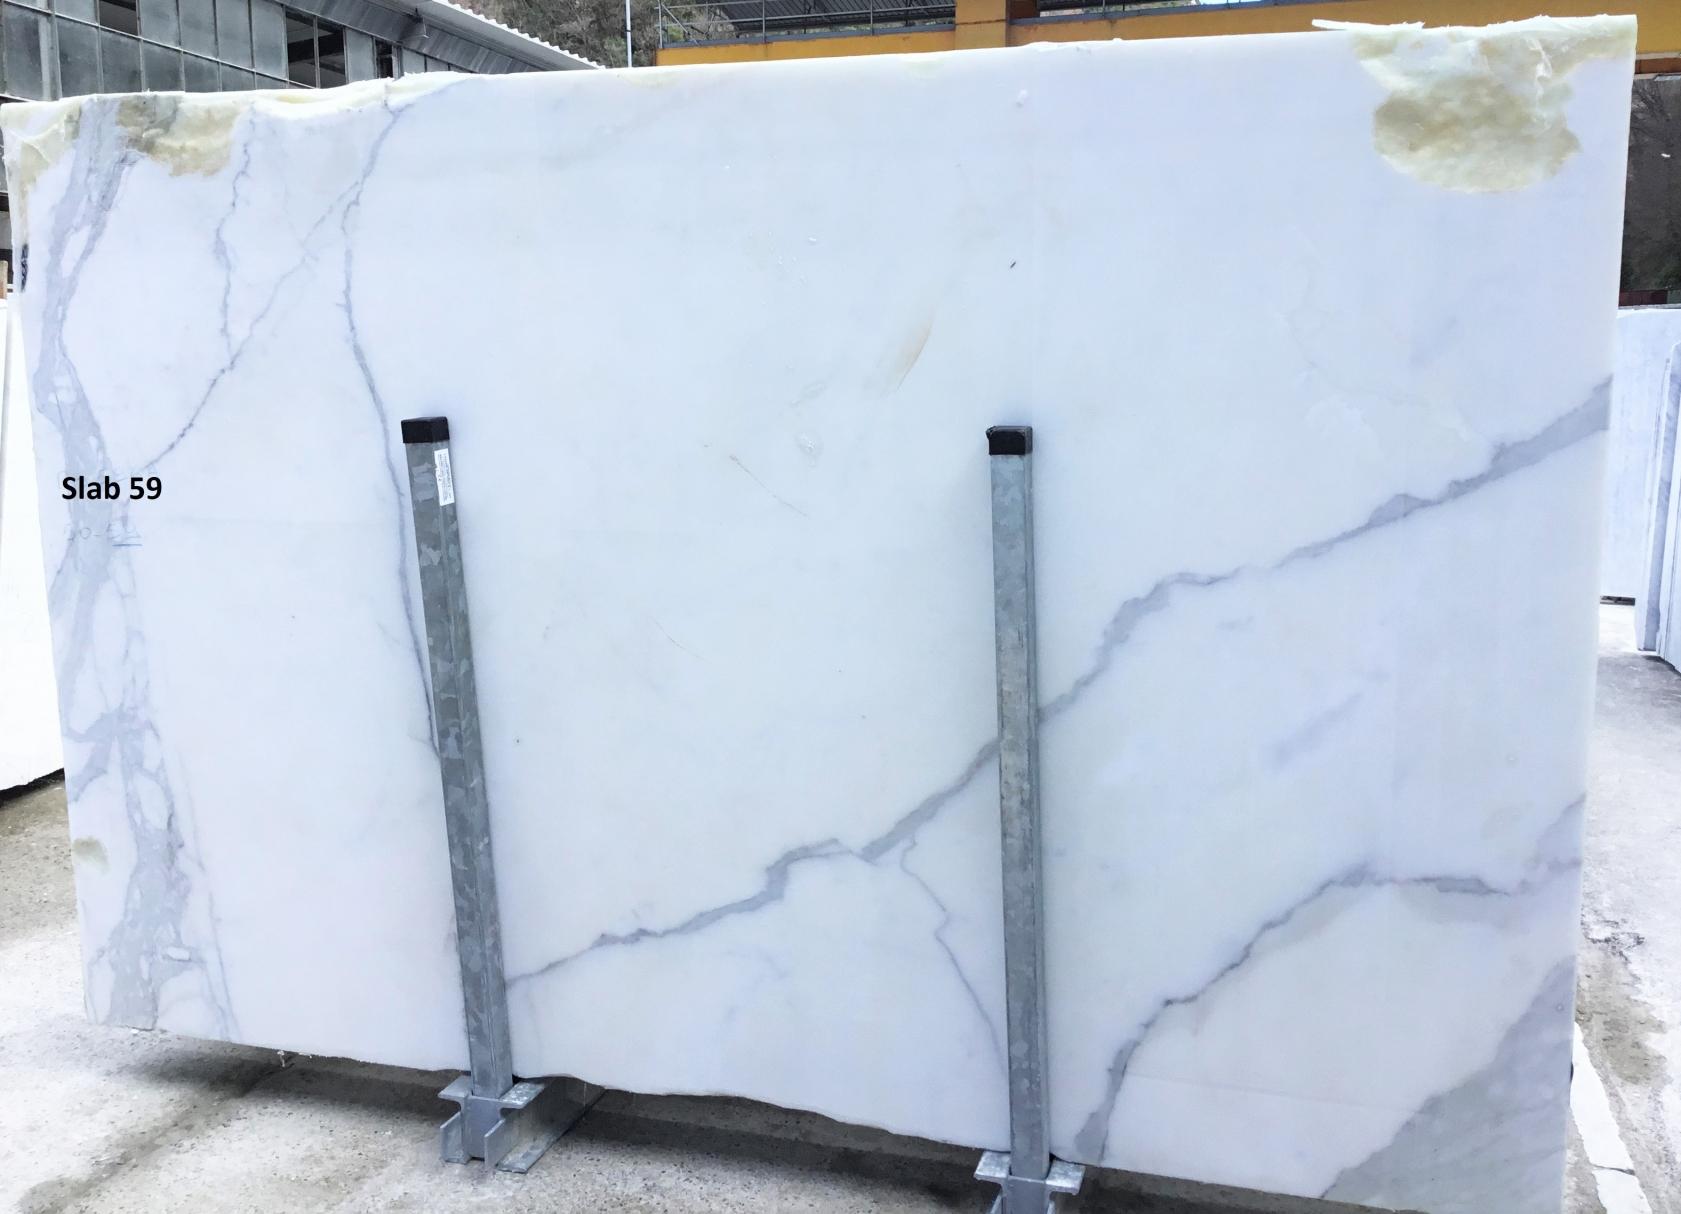 CALACATTA ORO EXTRA Suministro Veneto (Italia) de planchas pulidas en mármol natural GL D190223 , Bundle #4